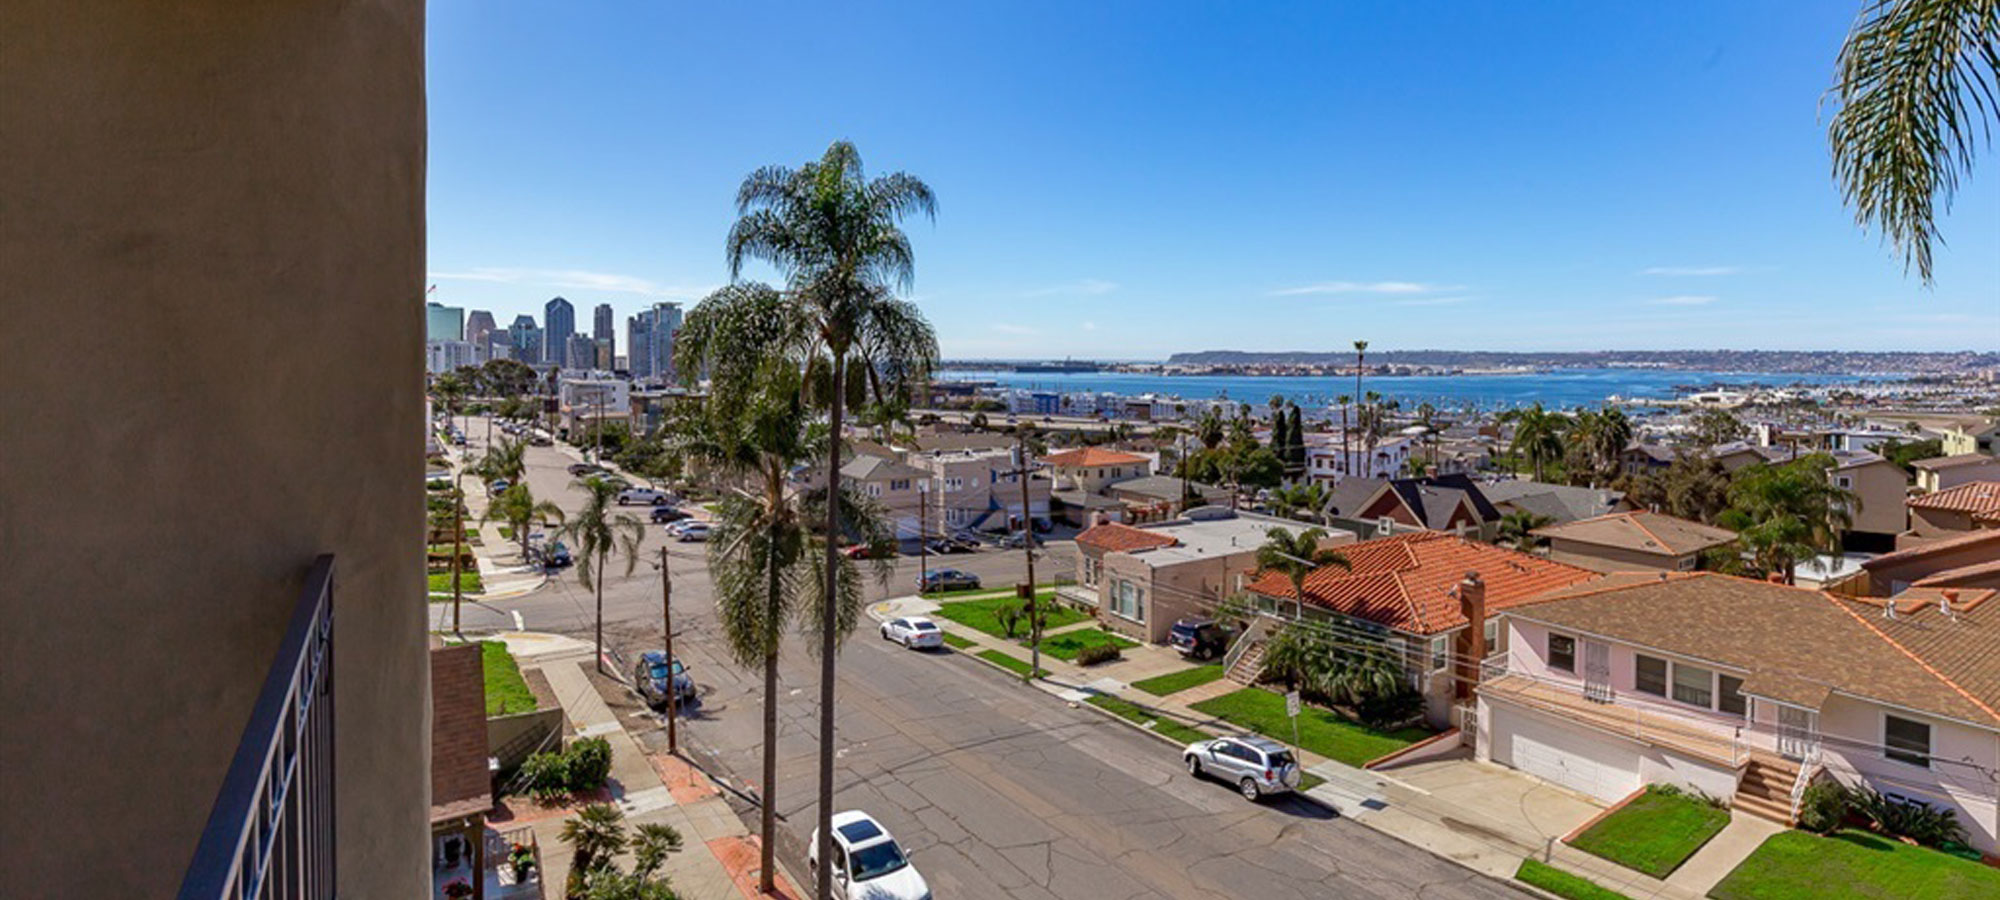 2445 Brant St UNIT 403 San Diego, CA 92101